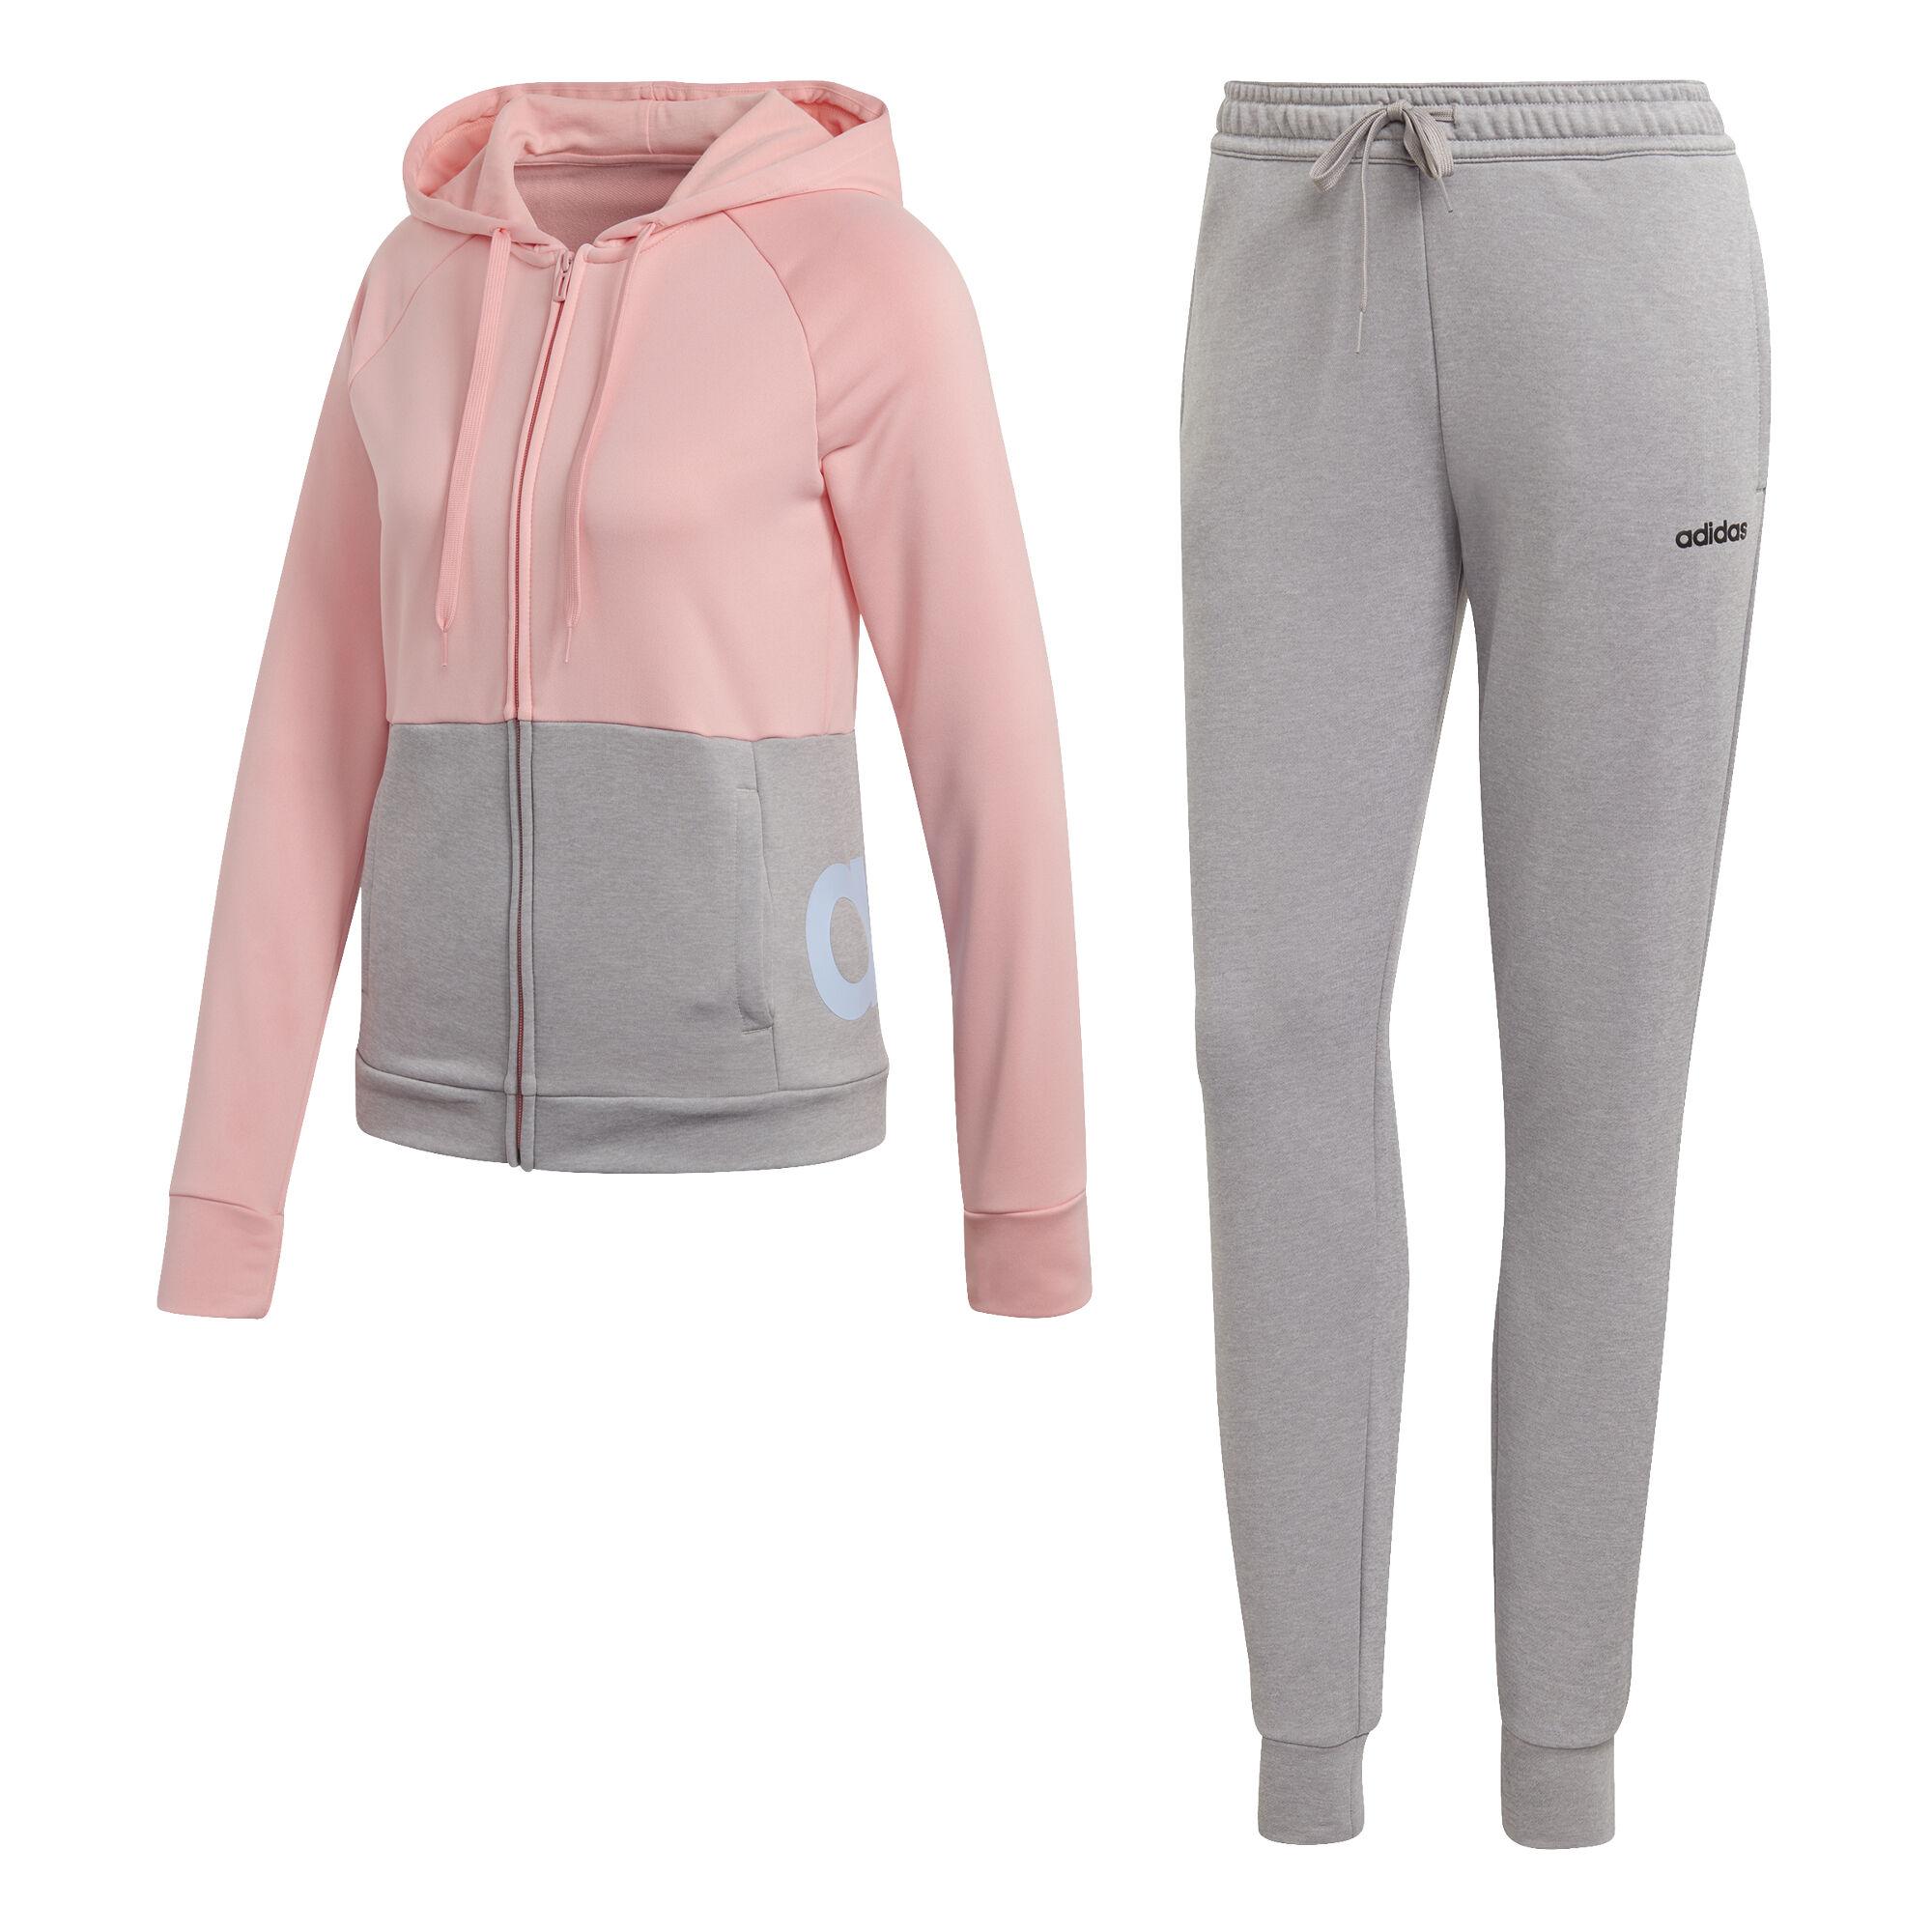 adidas Linear FT Trainingspak Dames Lichtgrijs, Roze